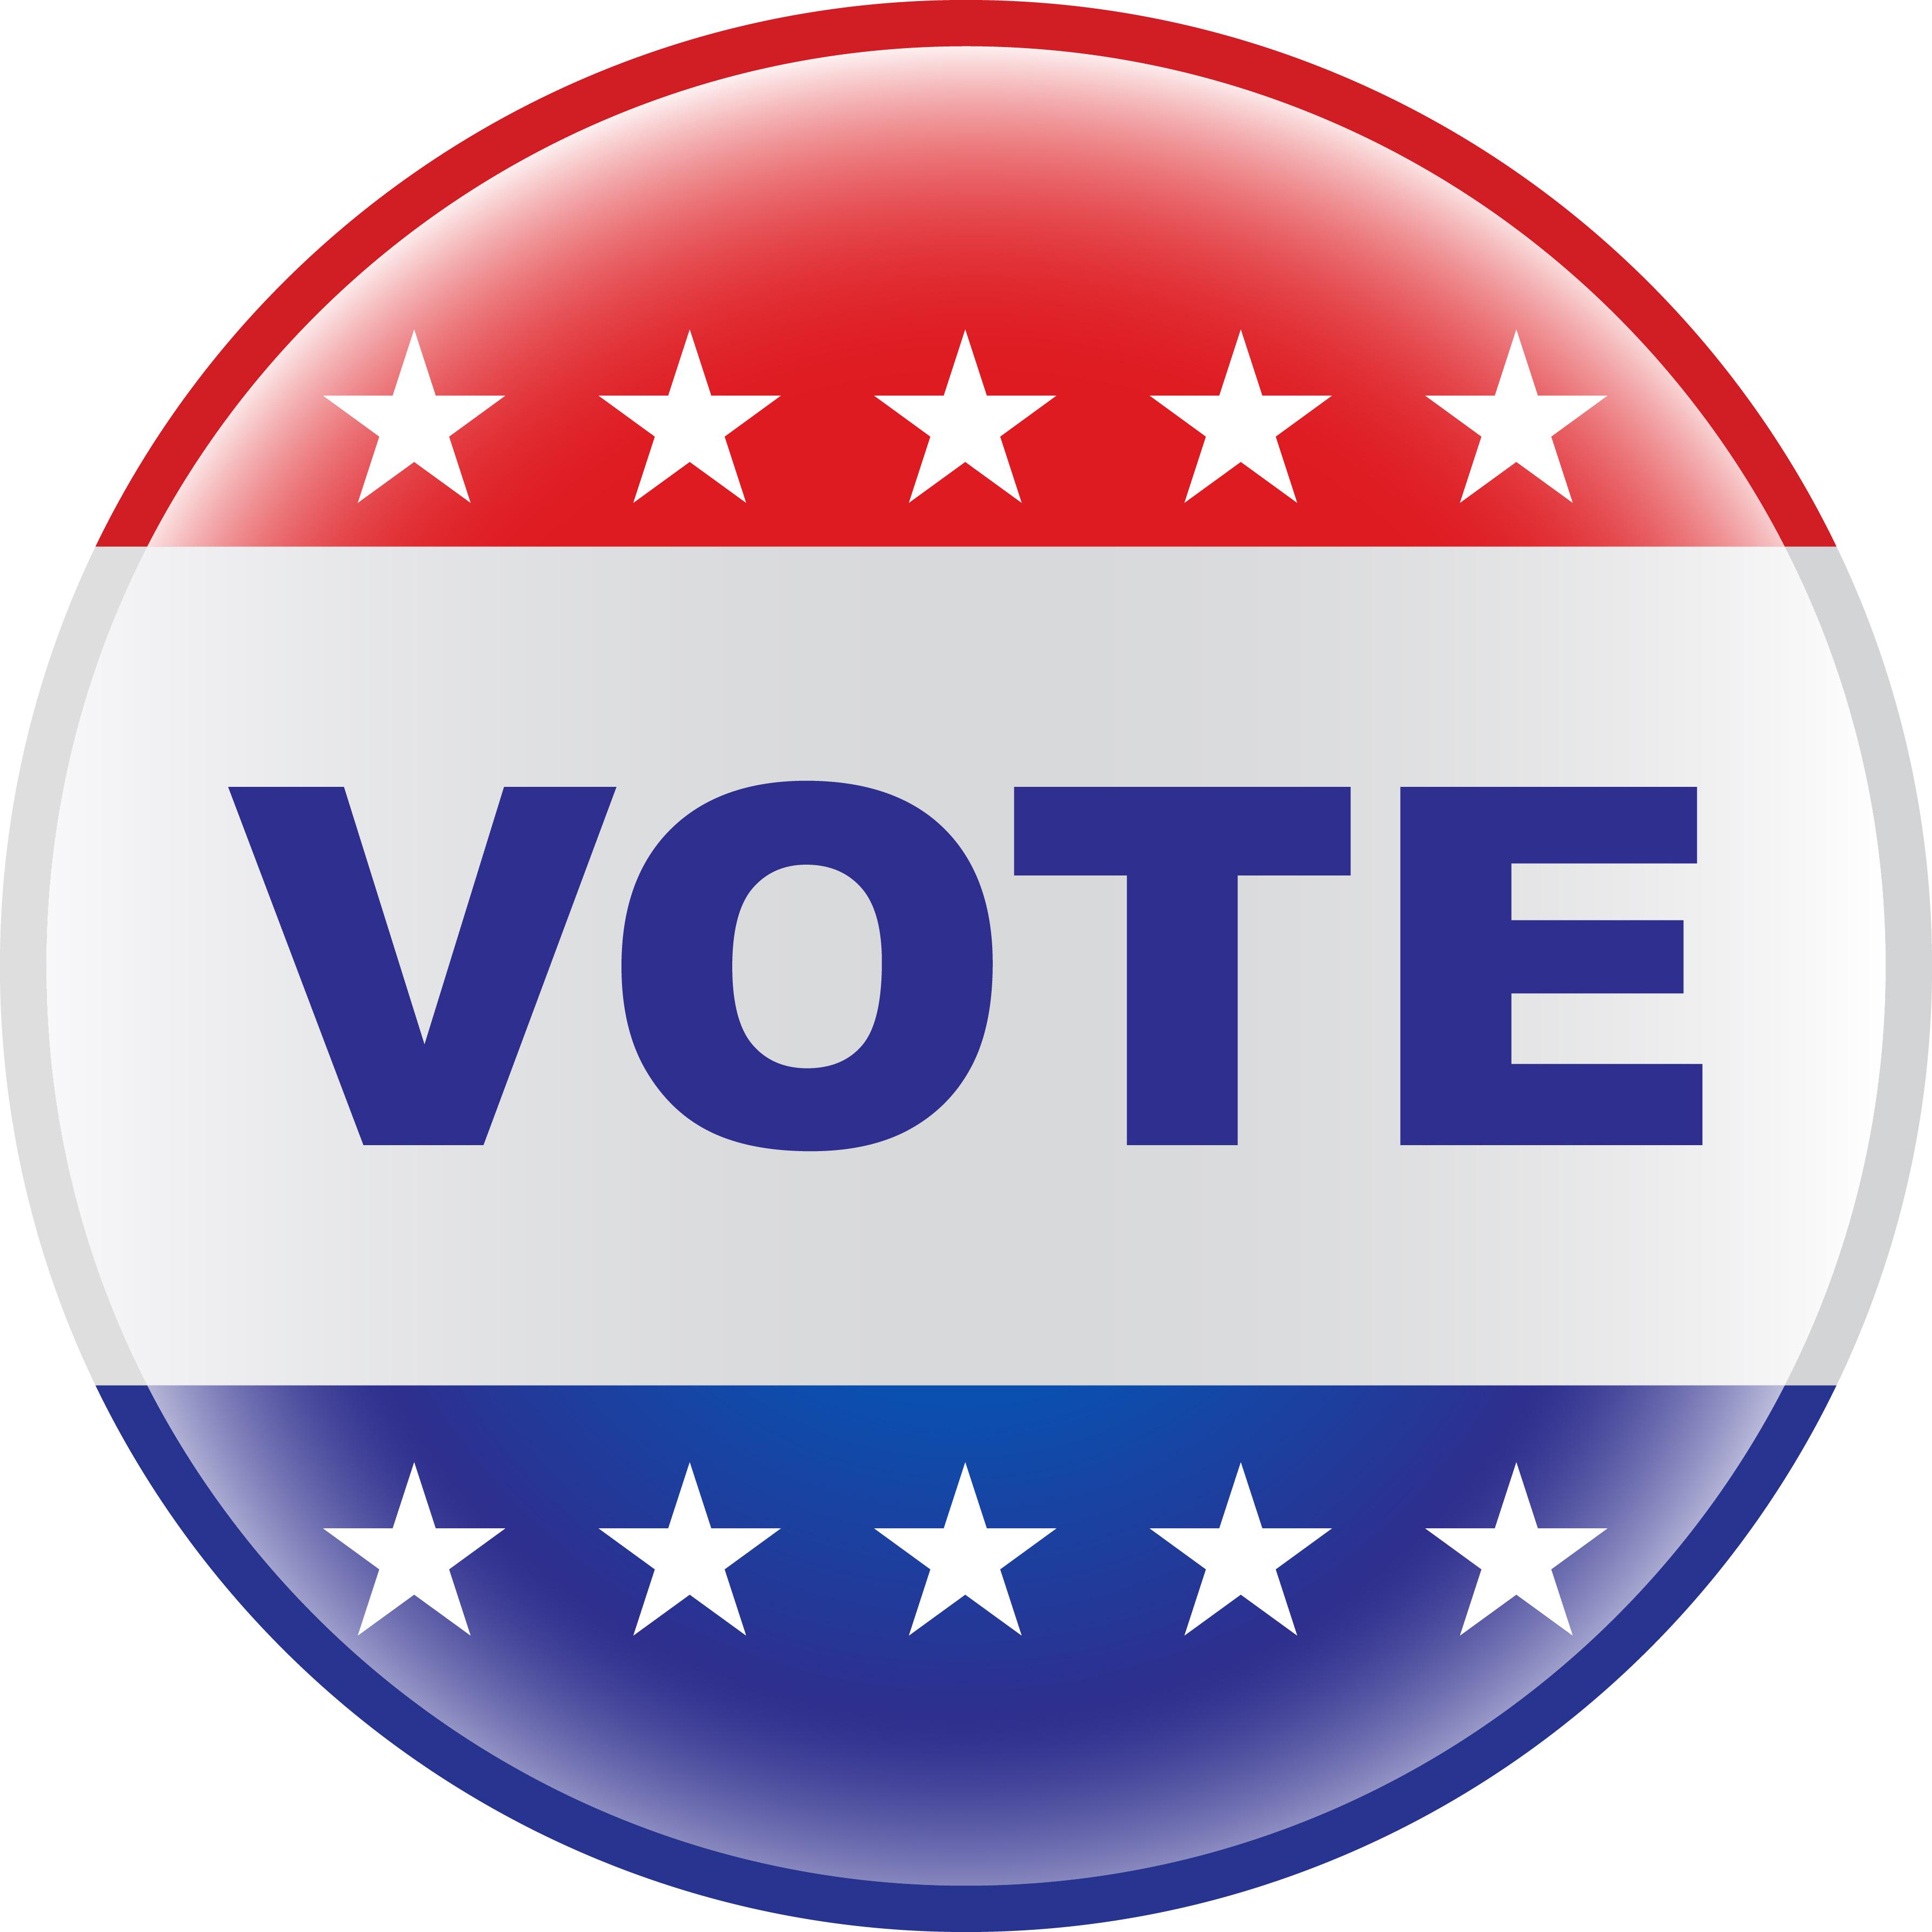 vote-icon-3.jpg